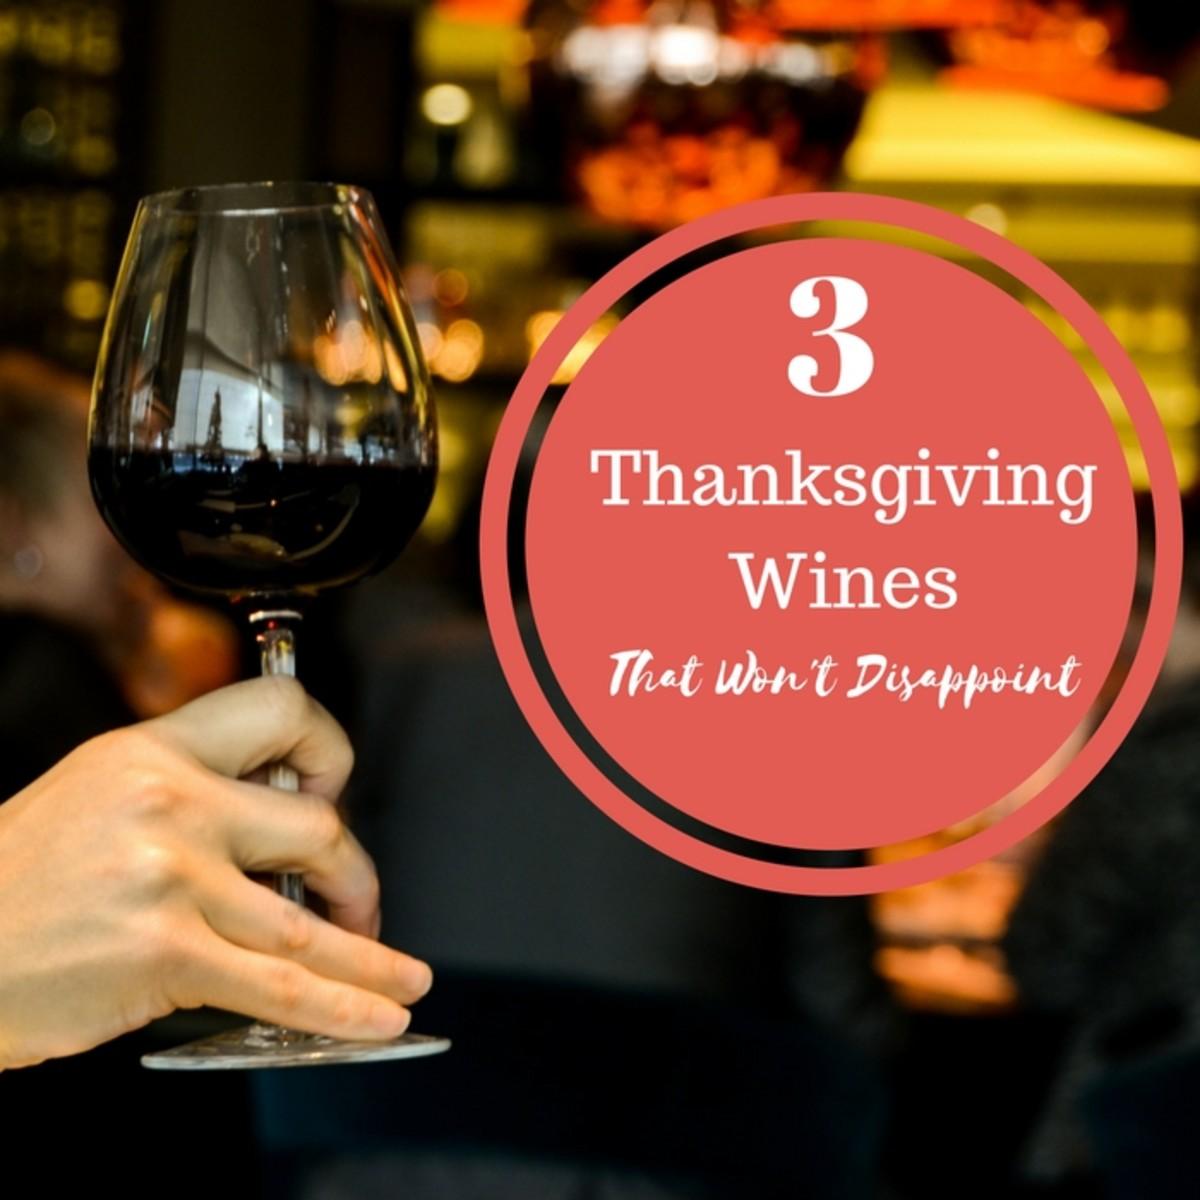 Saturday Sip - Thanksgiving Wines